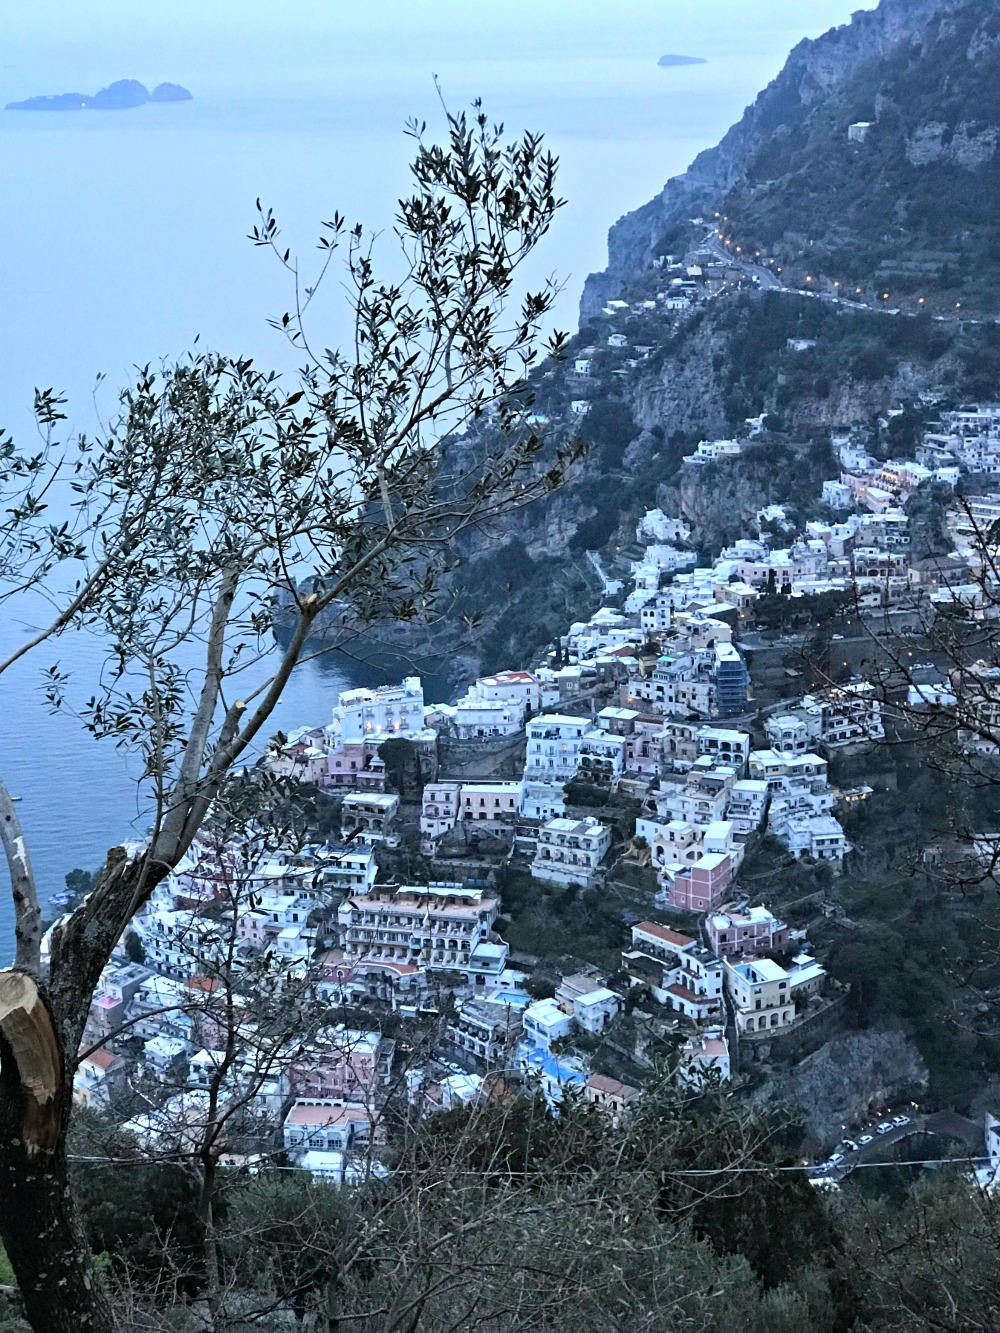 Positano Italy hillside